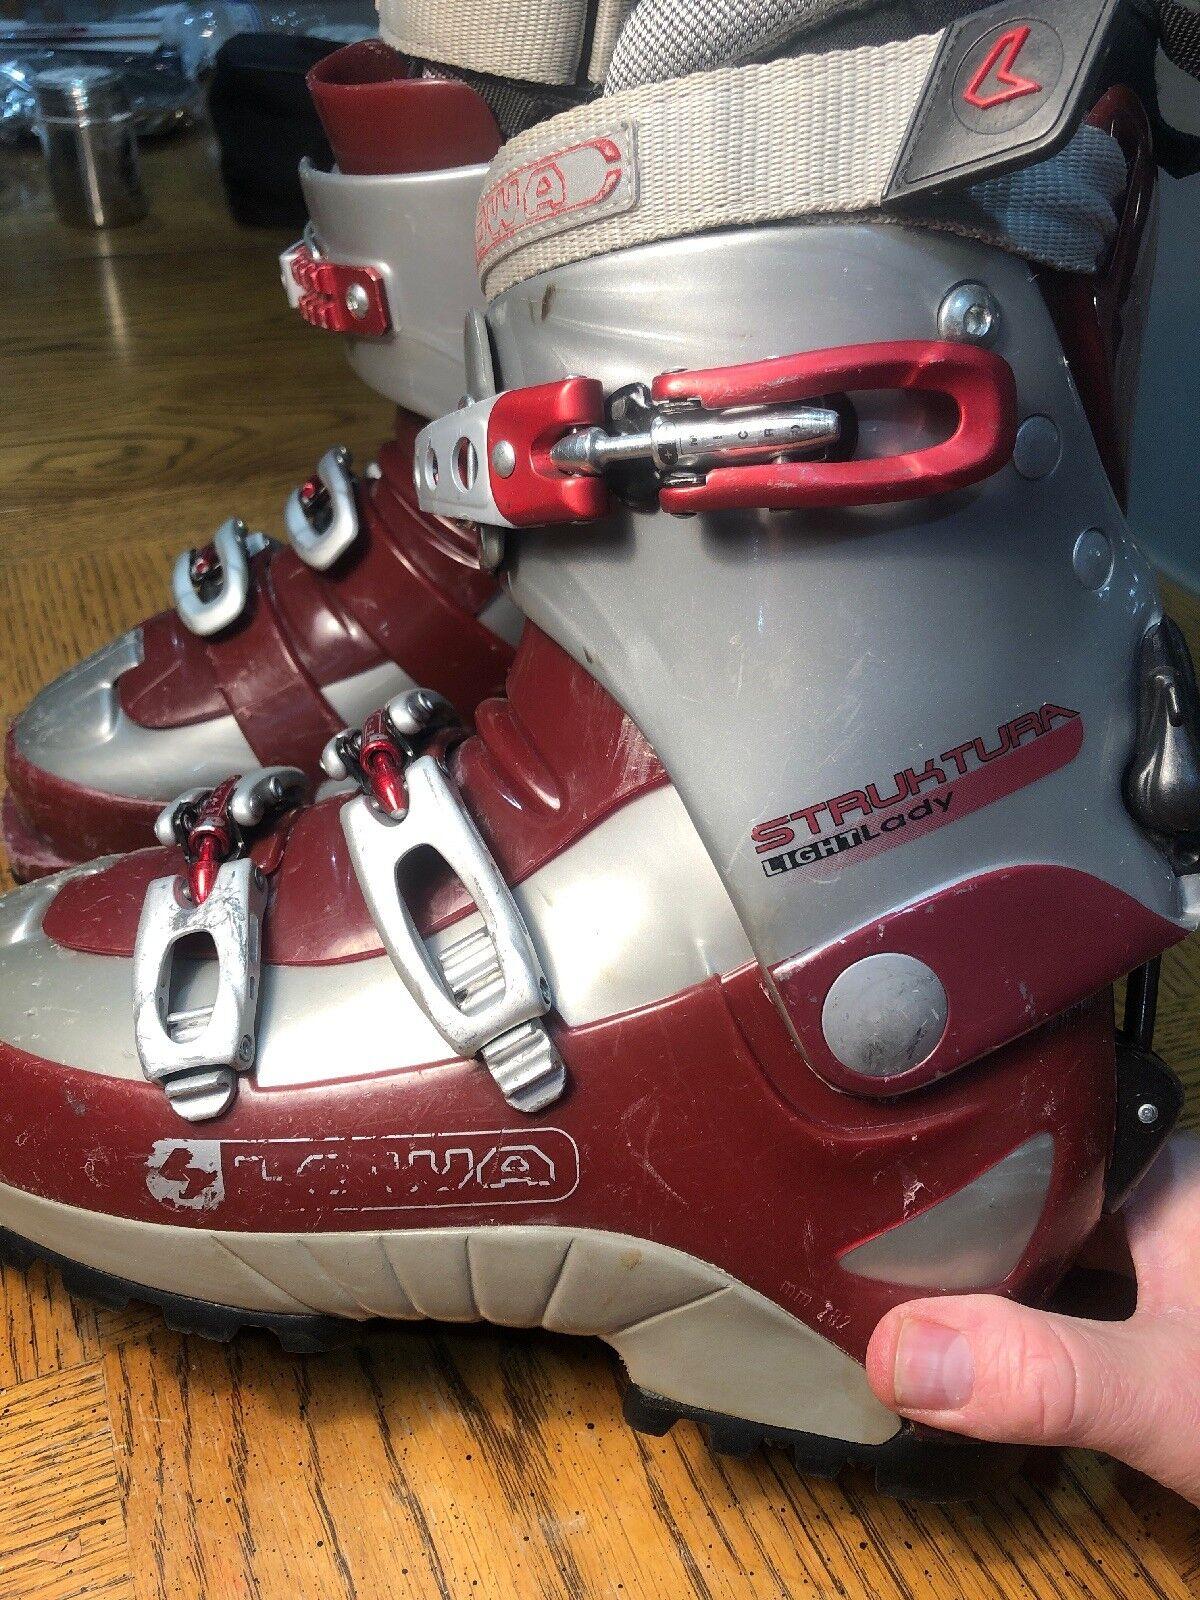 Lowa struktura, botas de esquí Light Lady, 7 yardas, EE.UU., 24,0 montés, 282 milímetros.